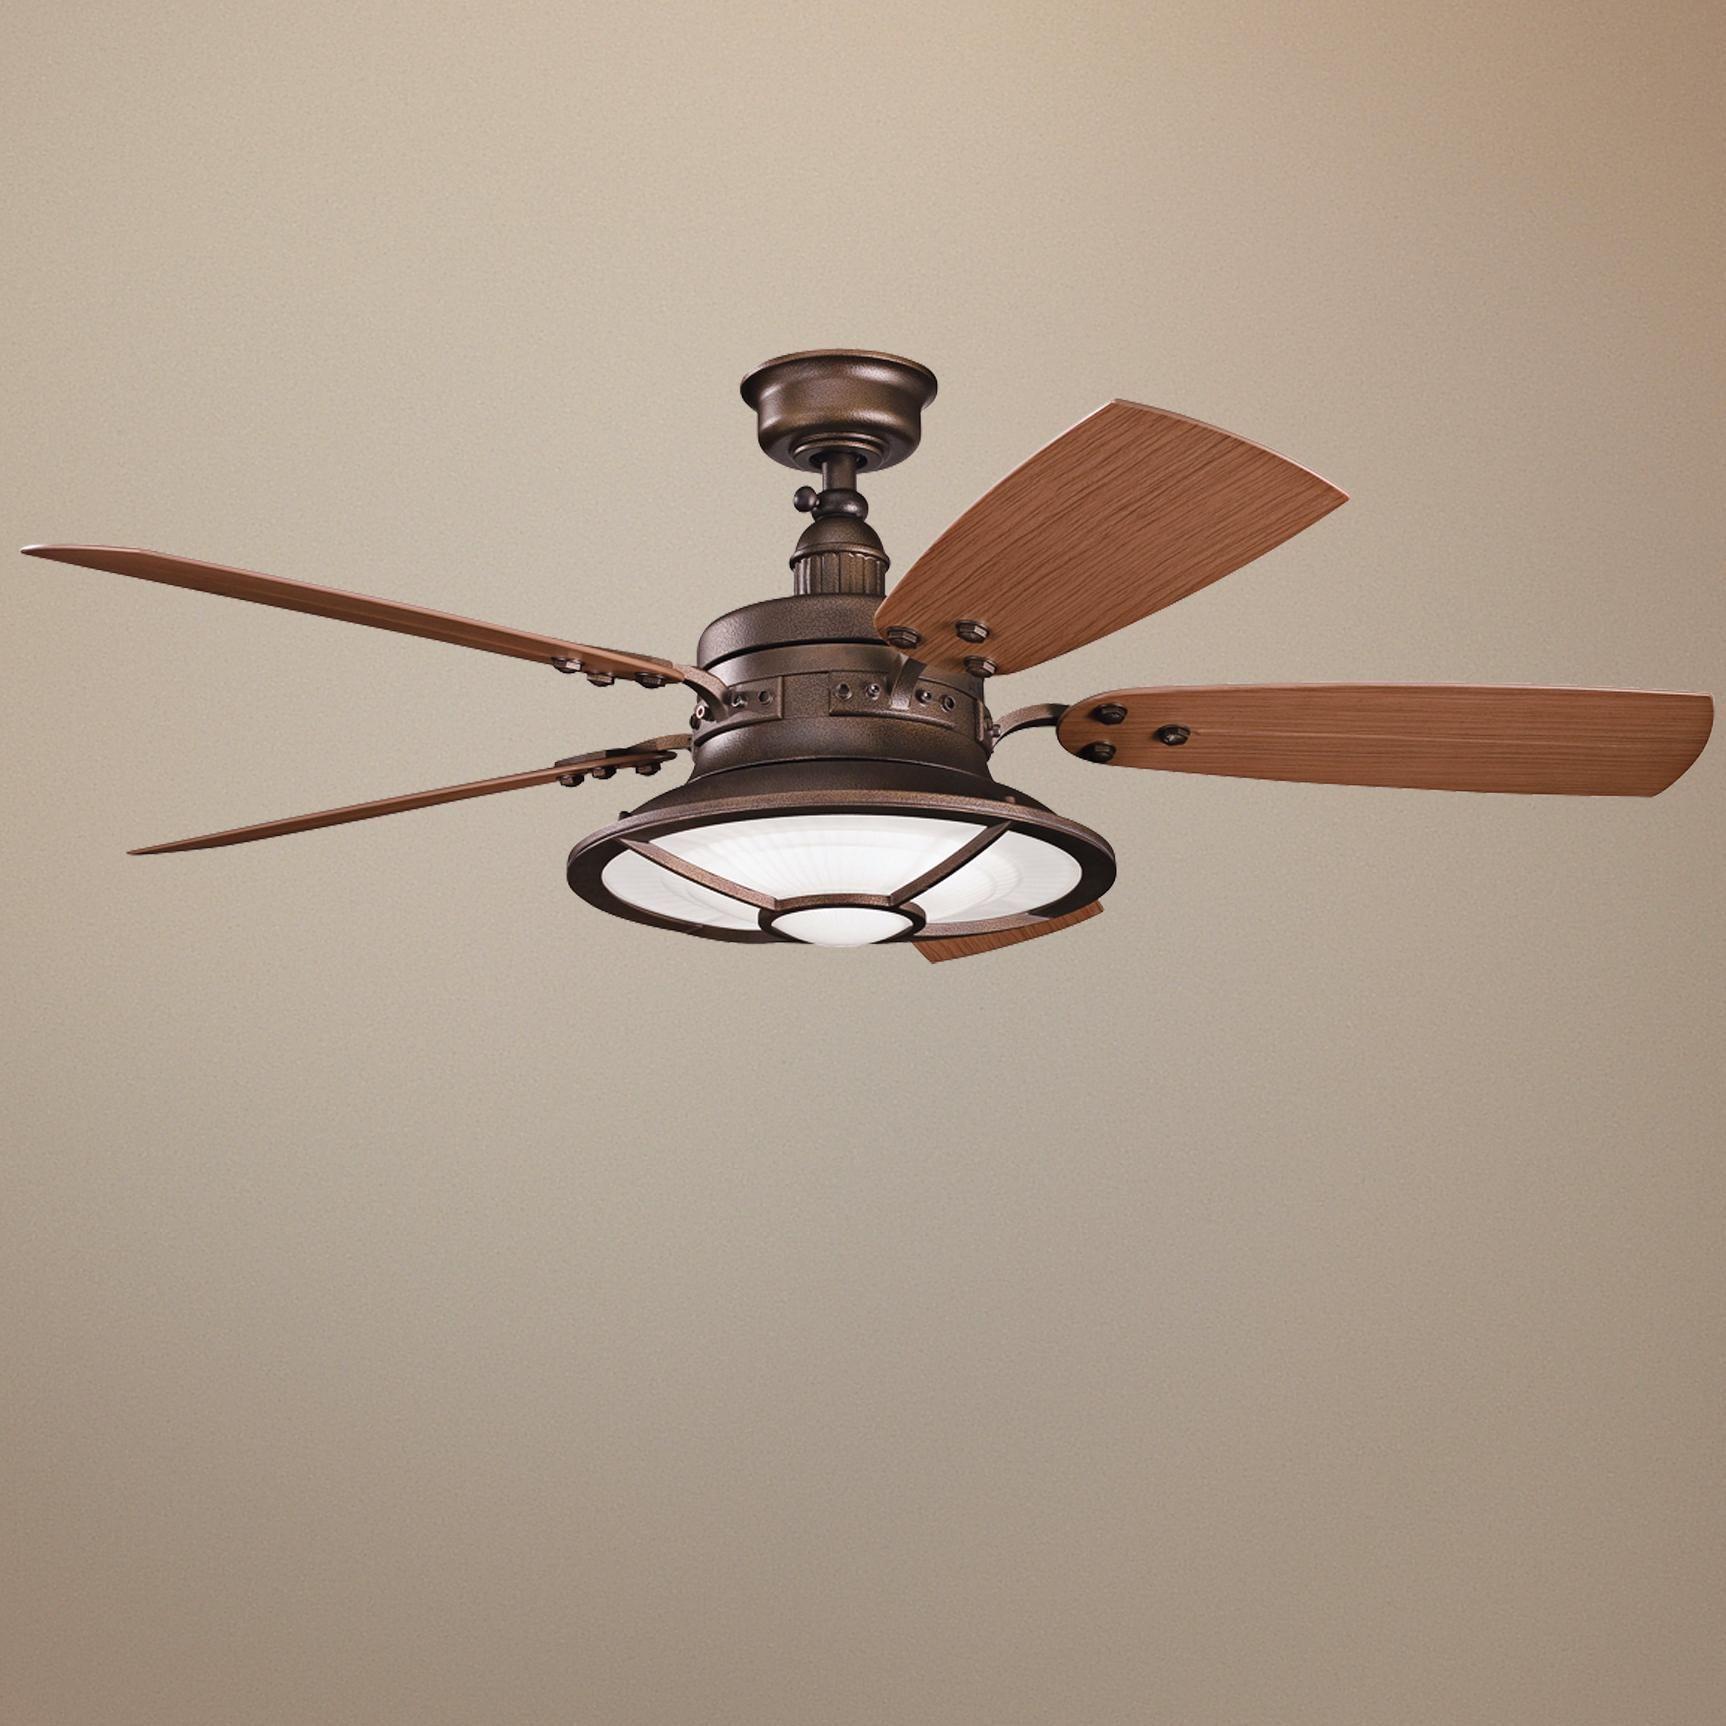 "52"" Kichler Harbour Walk Weathered Copper Finish Ceiling Fan"